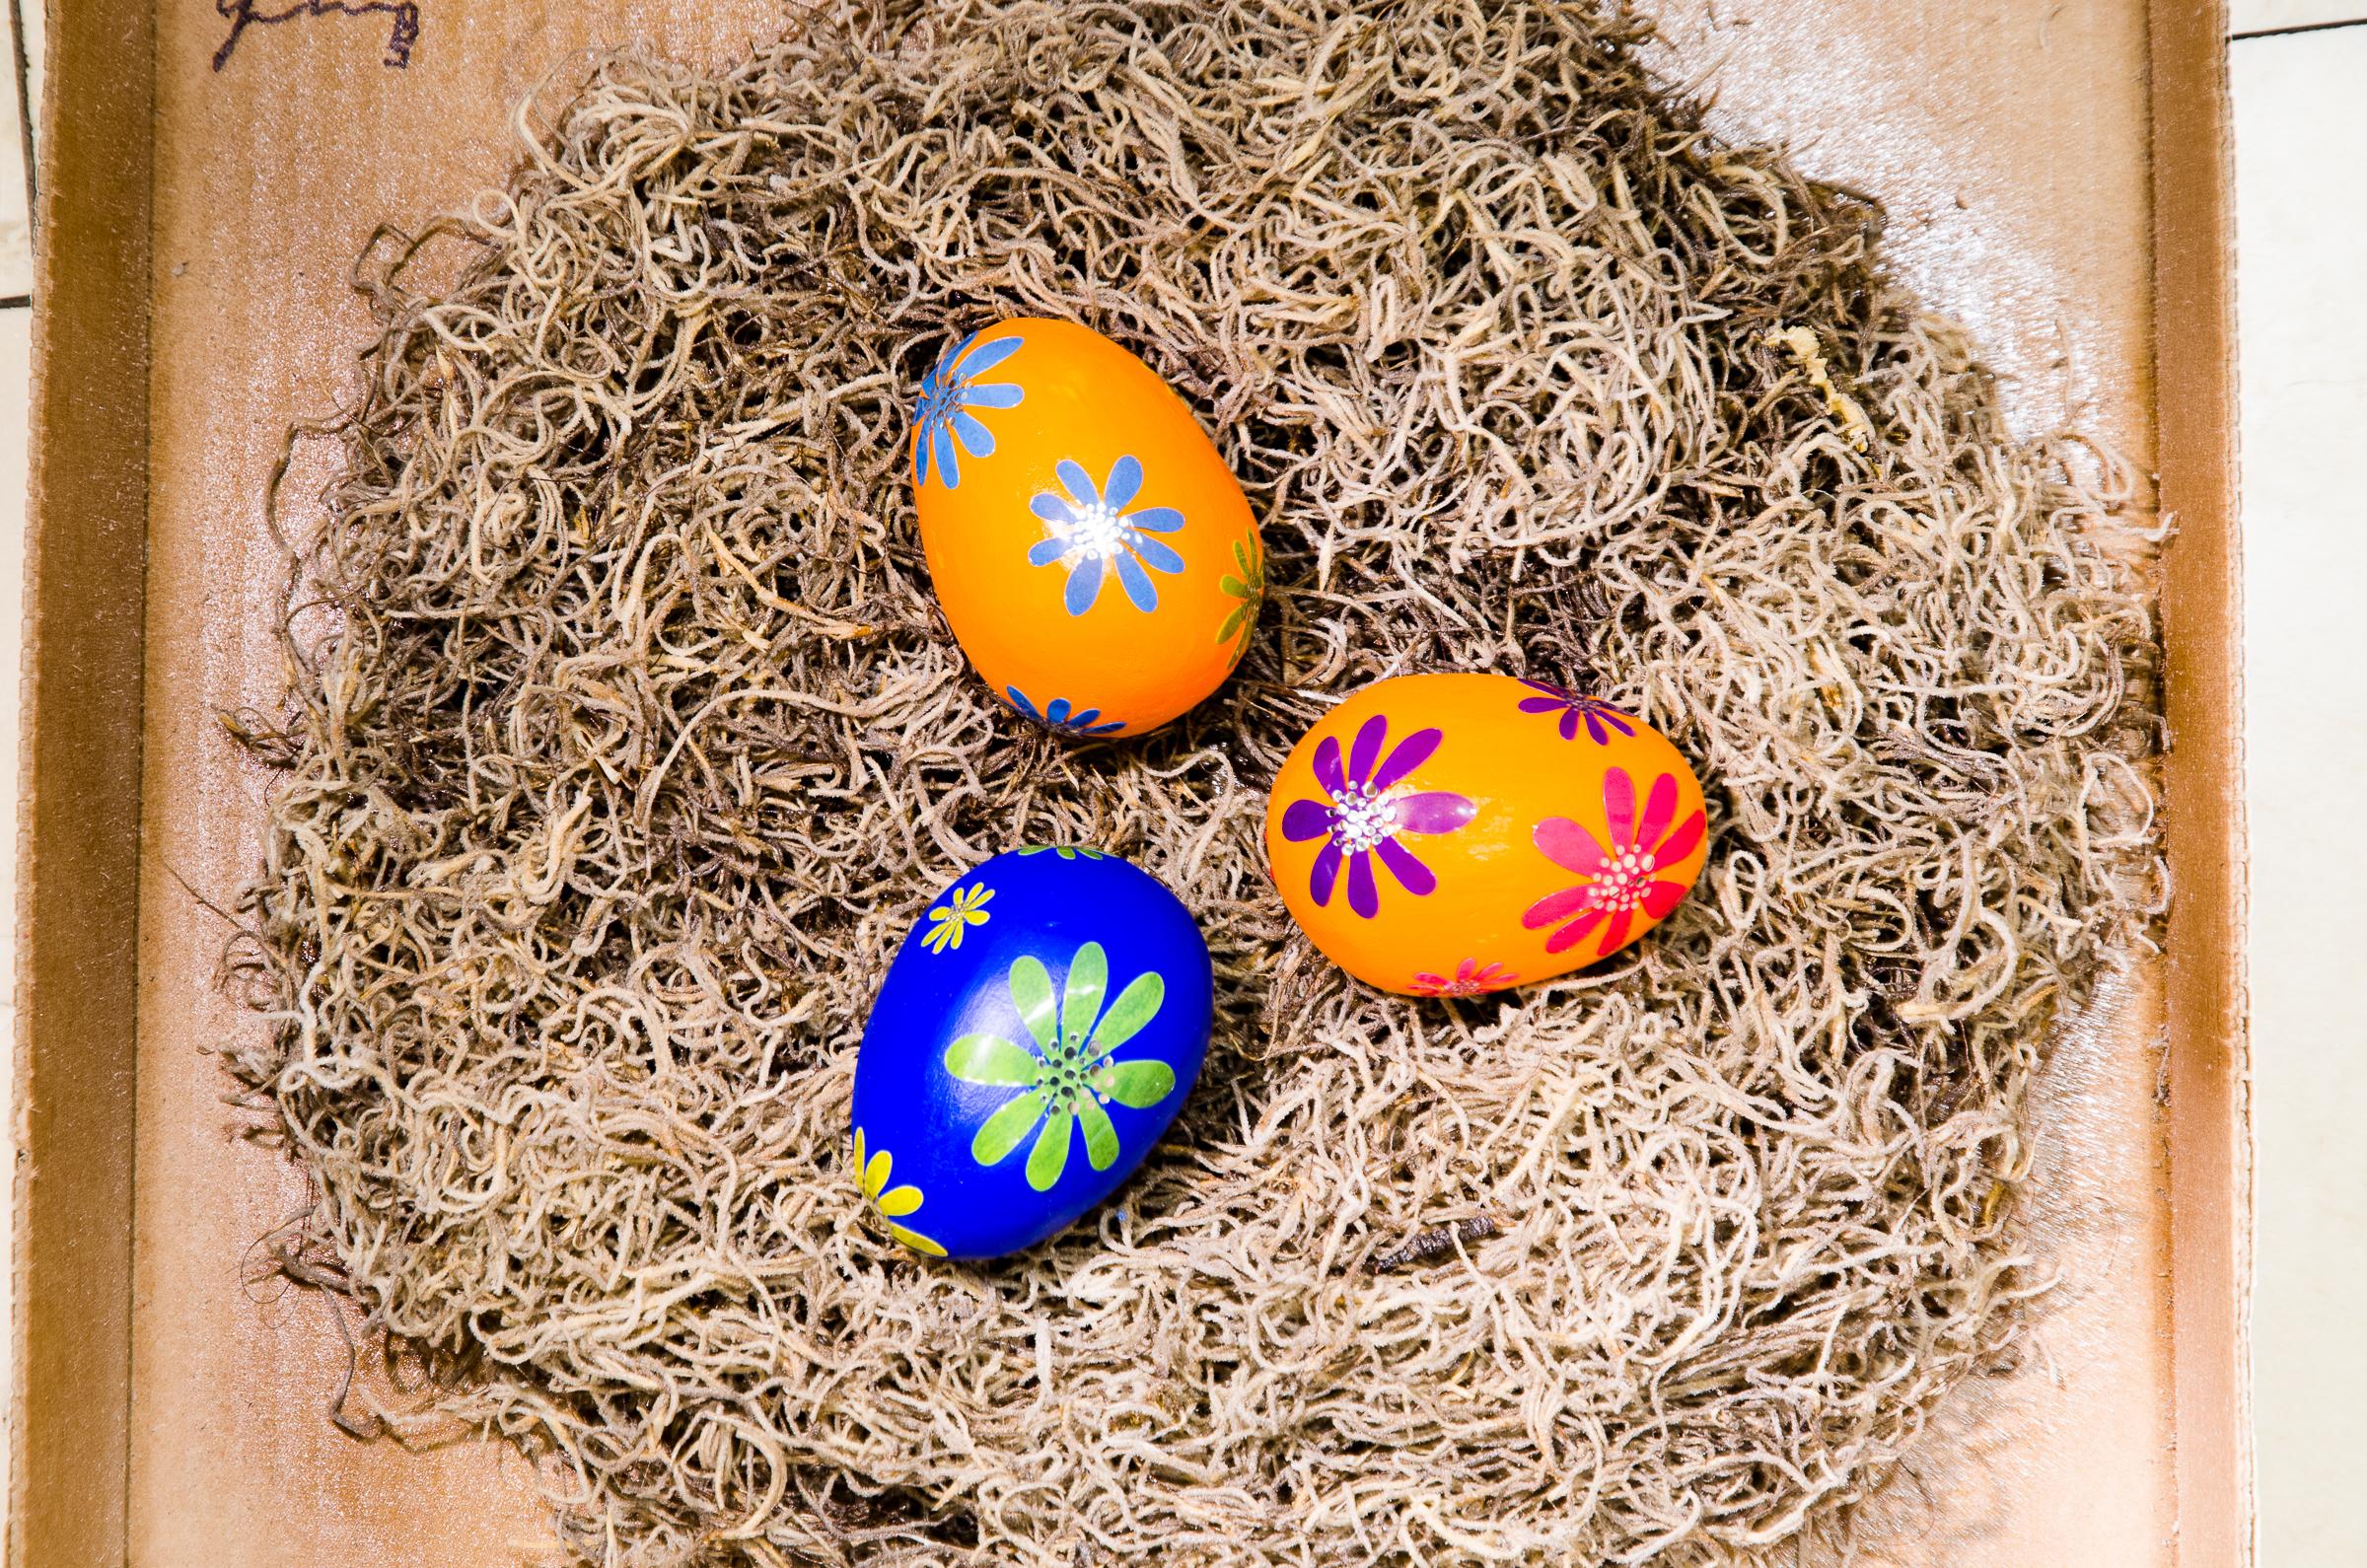 Sculpture showing eggs in a nest Taste of the Future by Beatriz Gerenstein